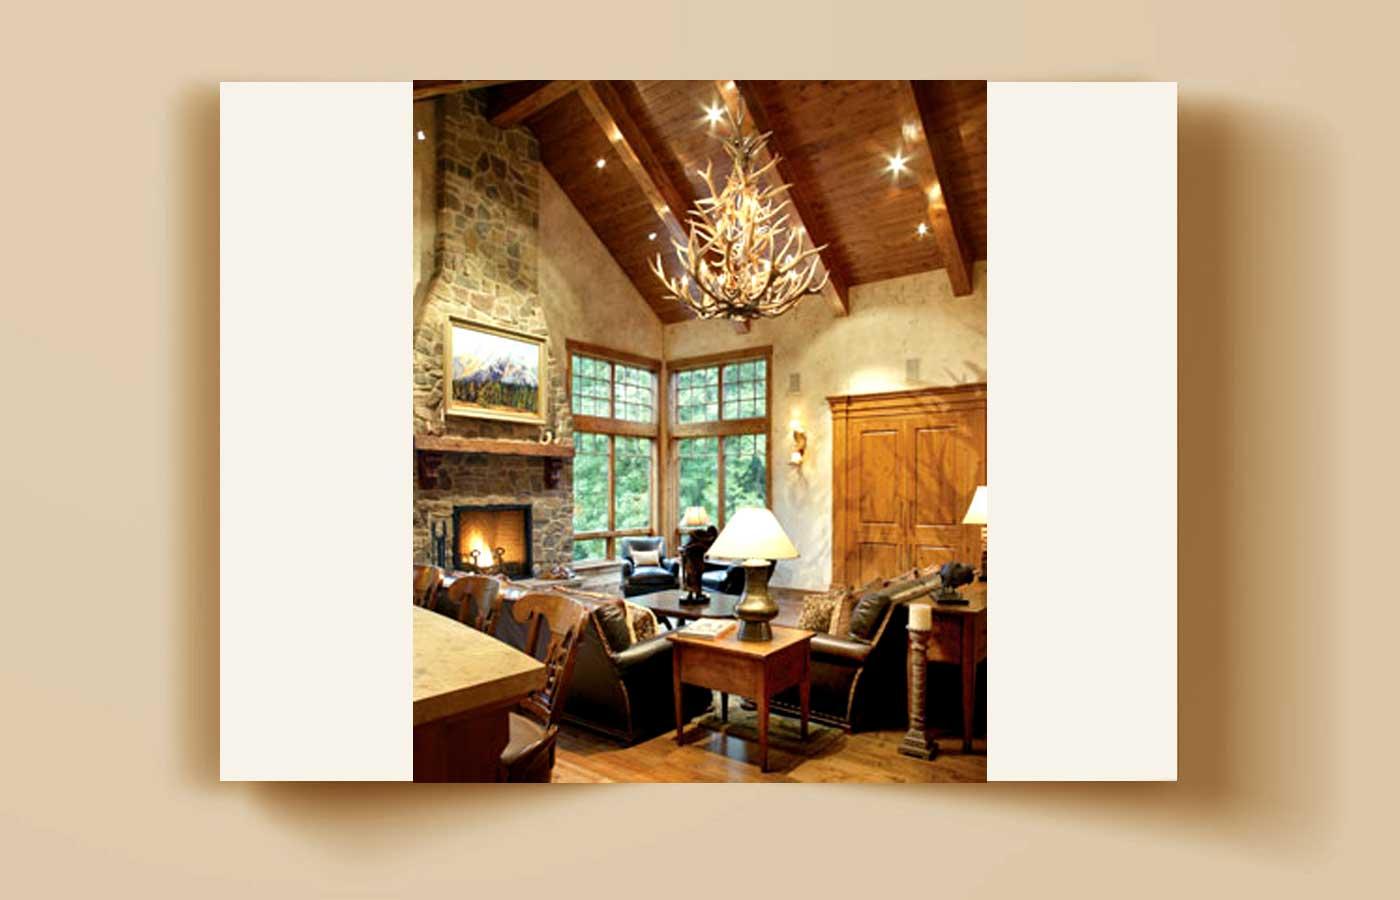 as 4 - لوستر در سبک های طراحی داخلی بی نظیر